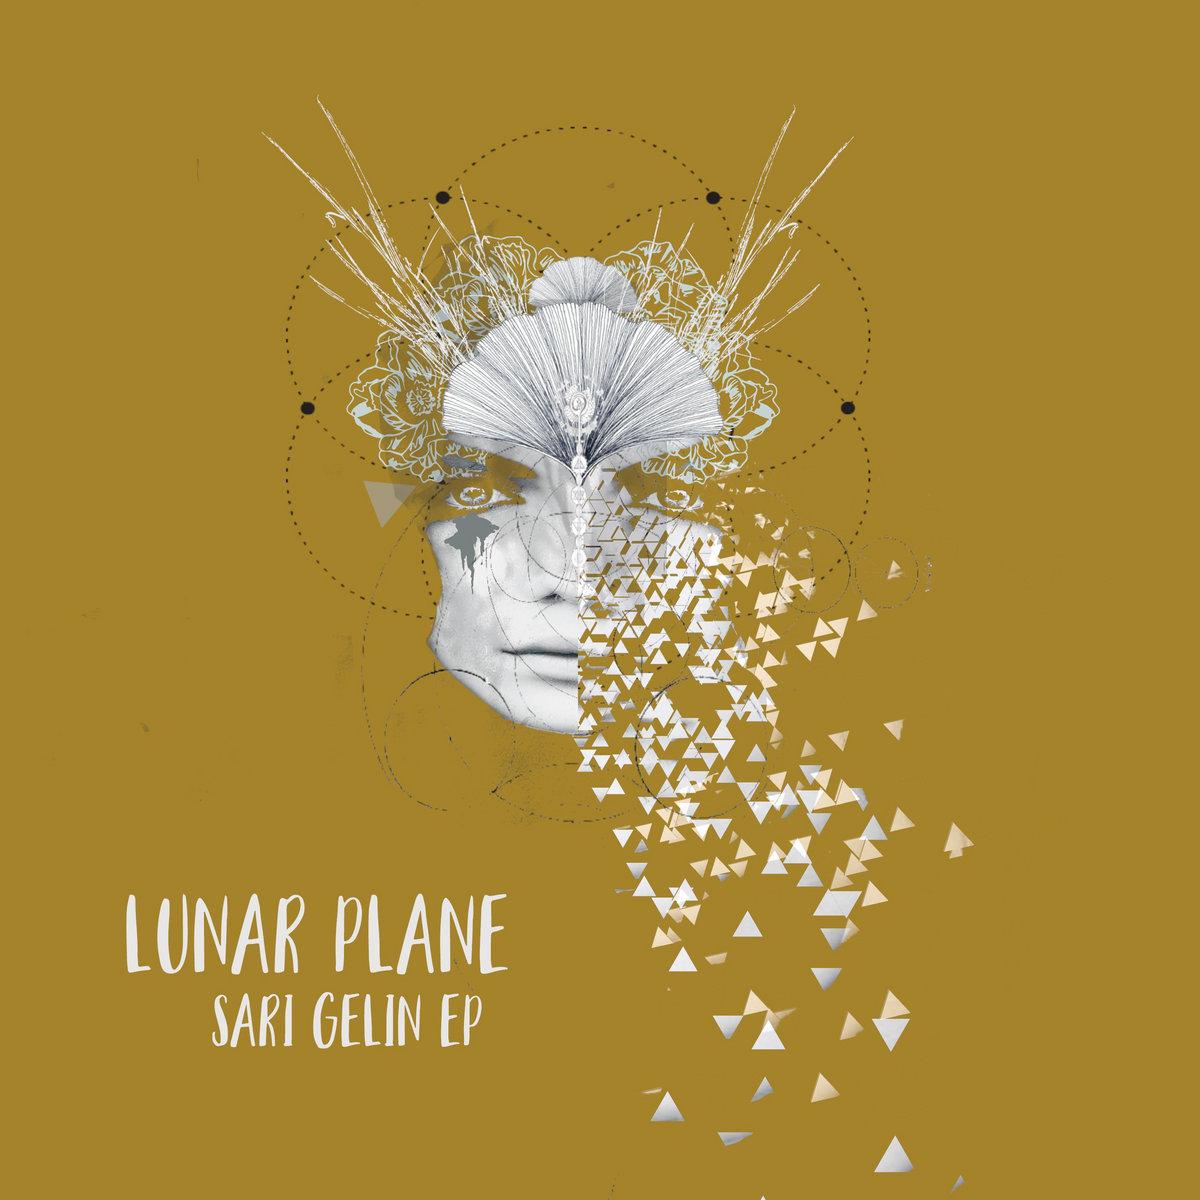 Sari Gelin Lunar Plane Underyourskin Records